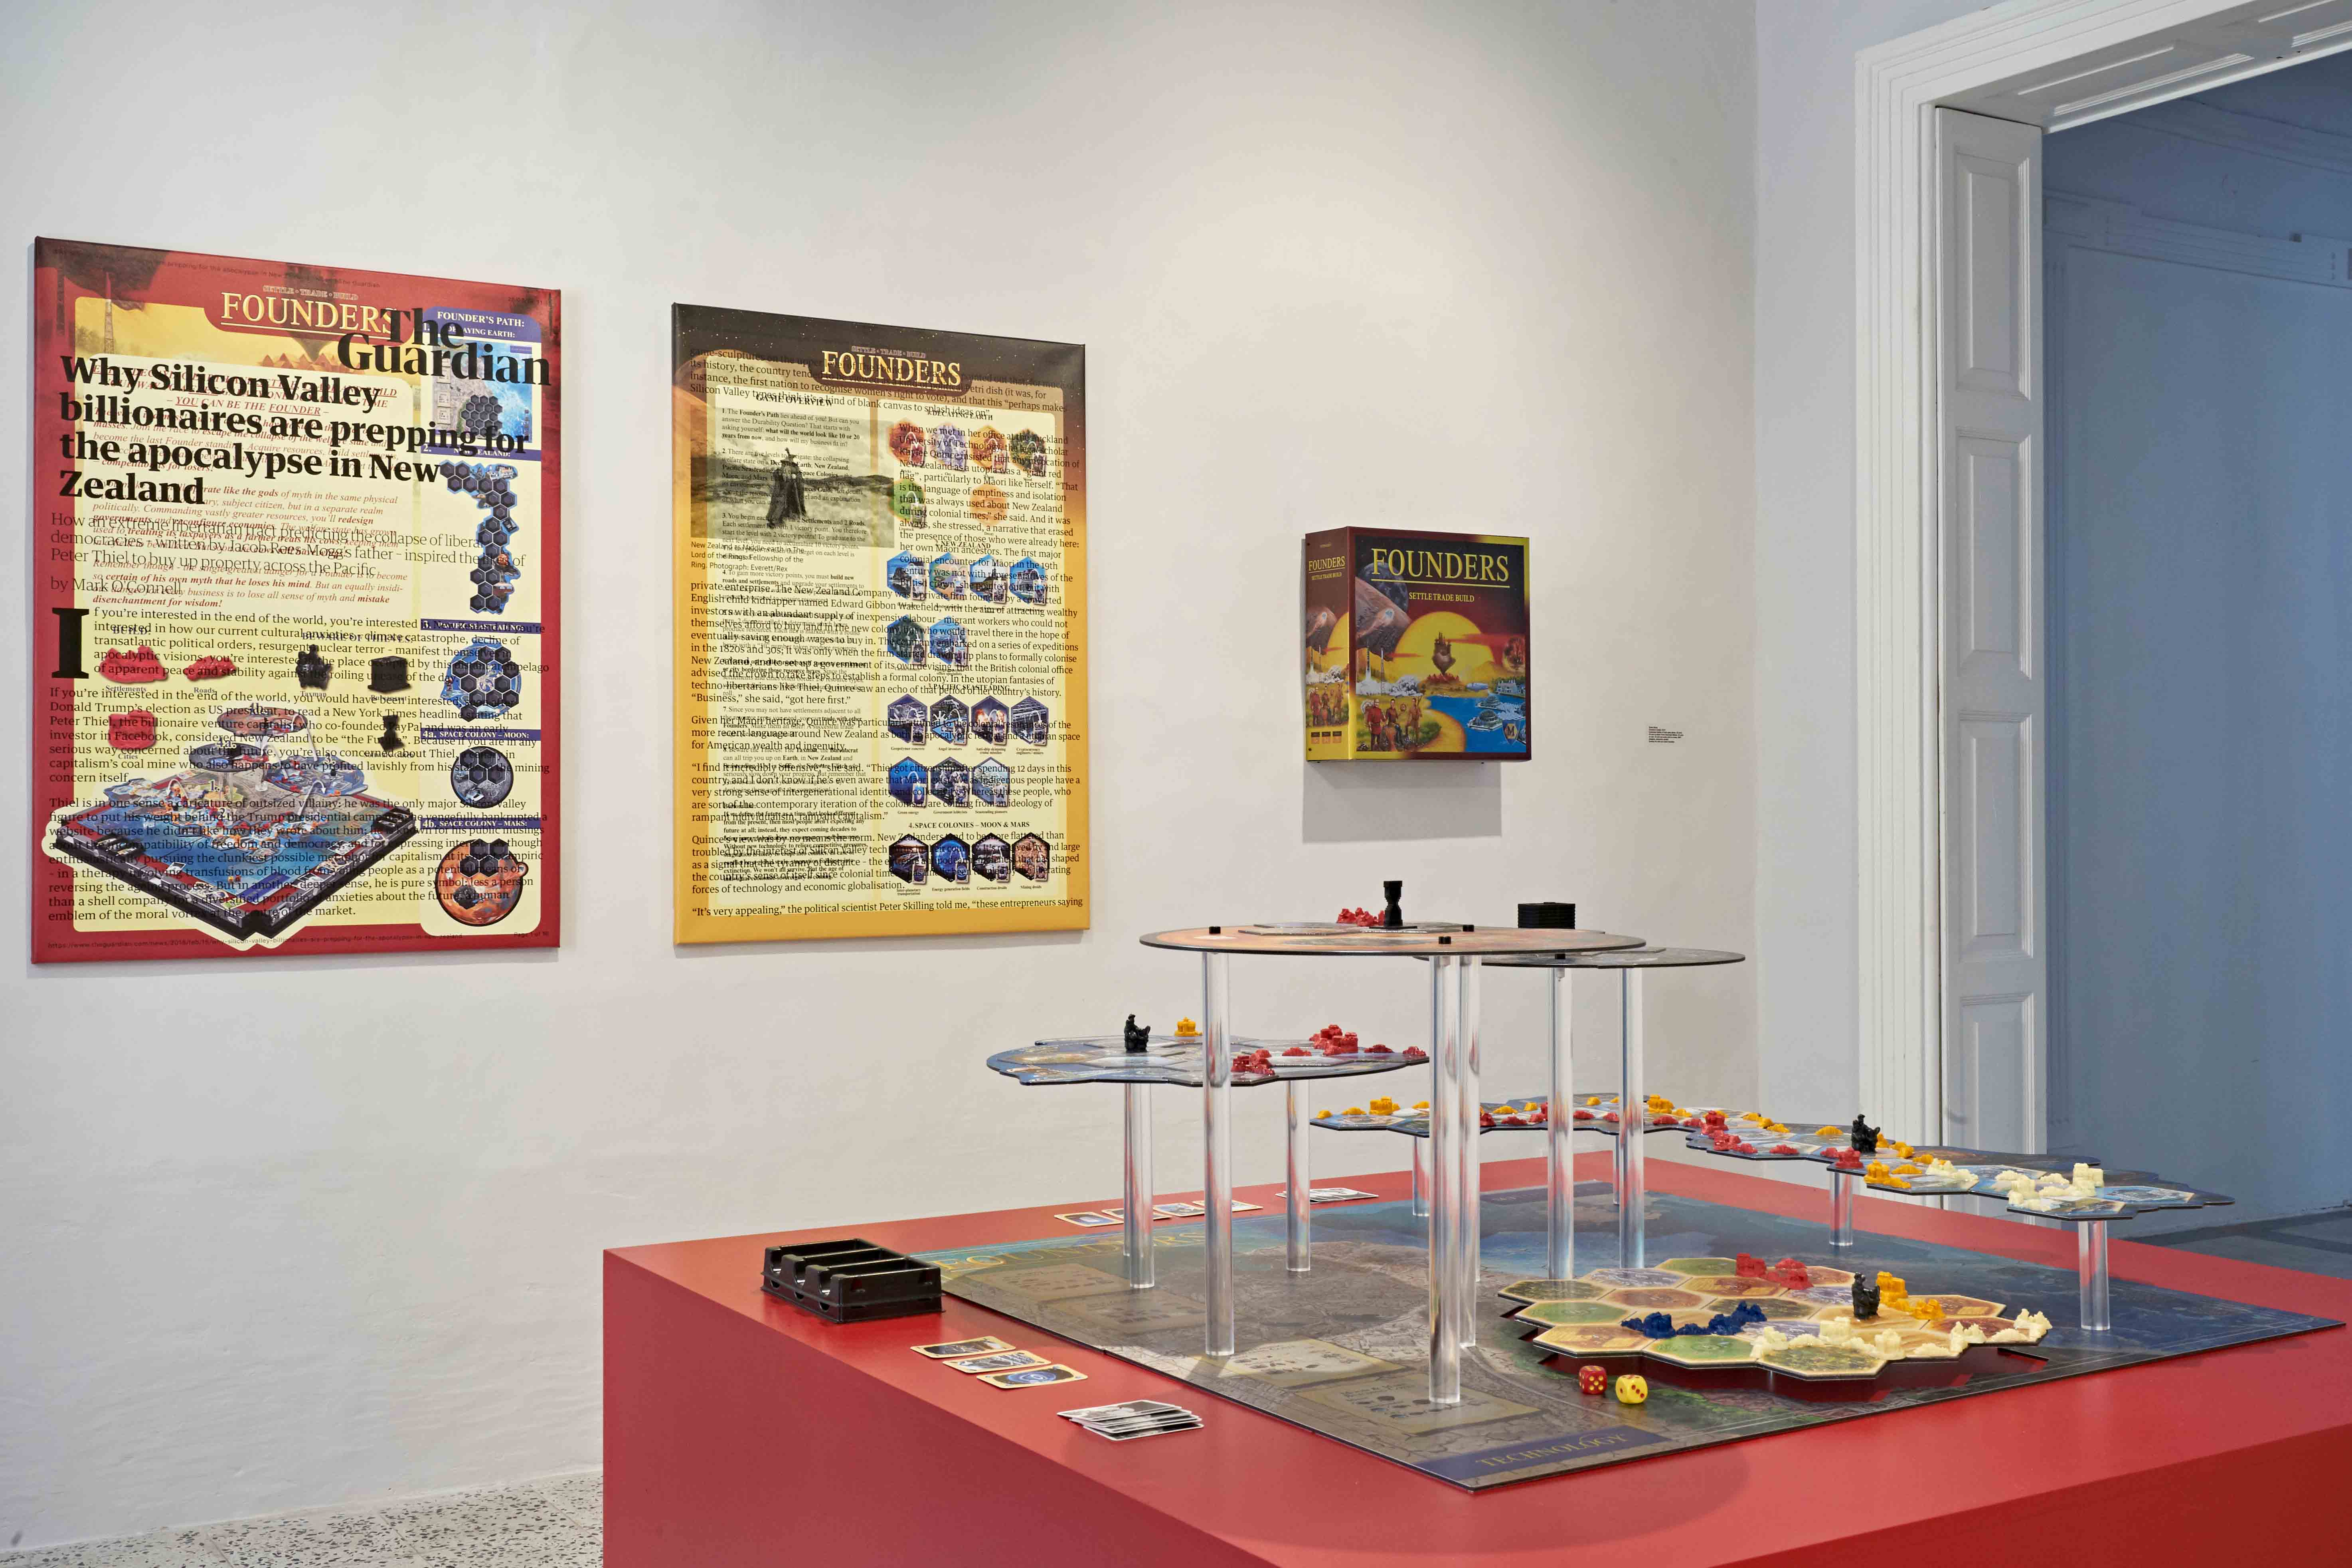 Simon Denny Founders.0 (study), 2019 Installation views, Courtesy the artist and Galerie Buchhloz Photo Alexandra Pace, Face with Tear of Joy (April - June 2019), courtesy Blitz Valletta